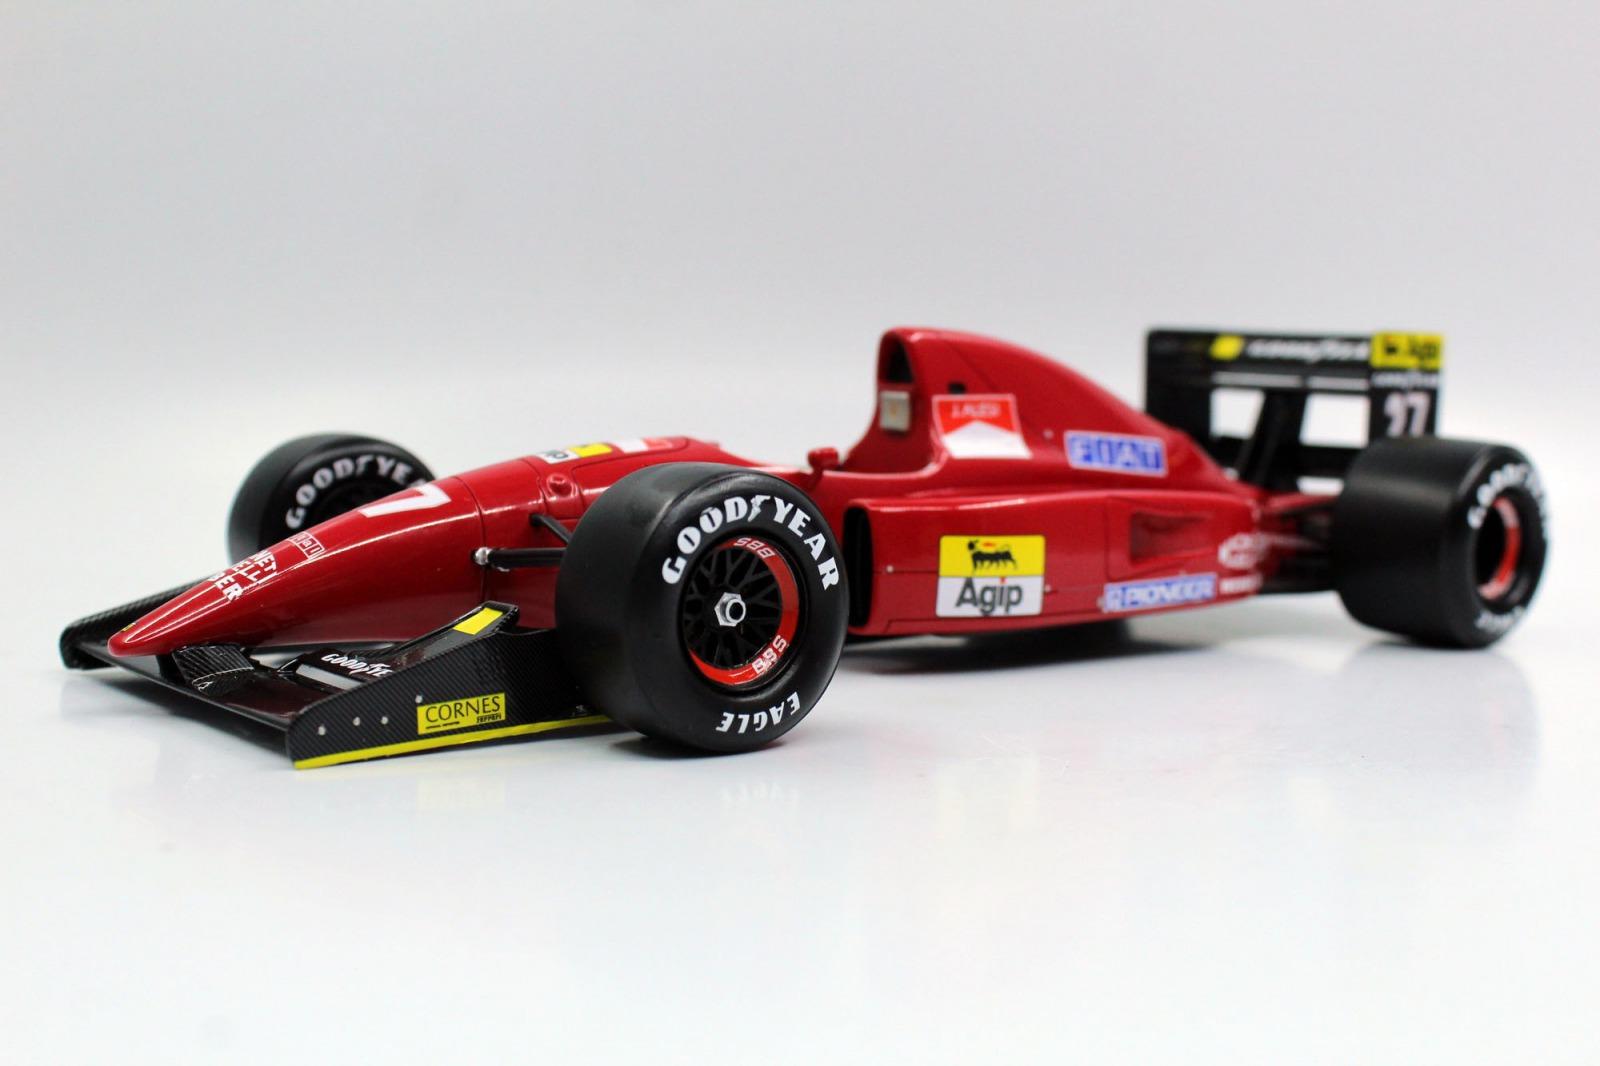 GP Replicas 1/18 ミニカー レジン プロポーションモデル 1992年シーズン フェラーリ F1 F92AGP-REPLICAS - 1/18 - FERRARI - F1 F92A SEASON 1992